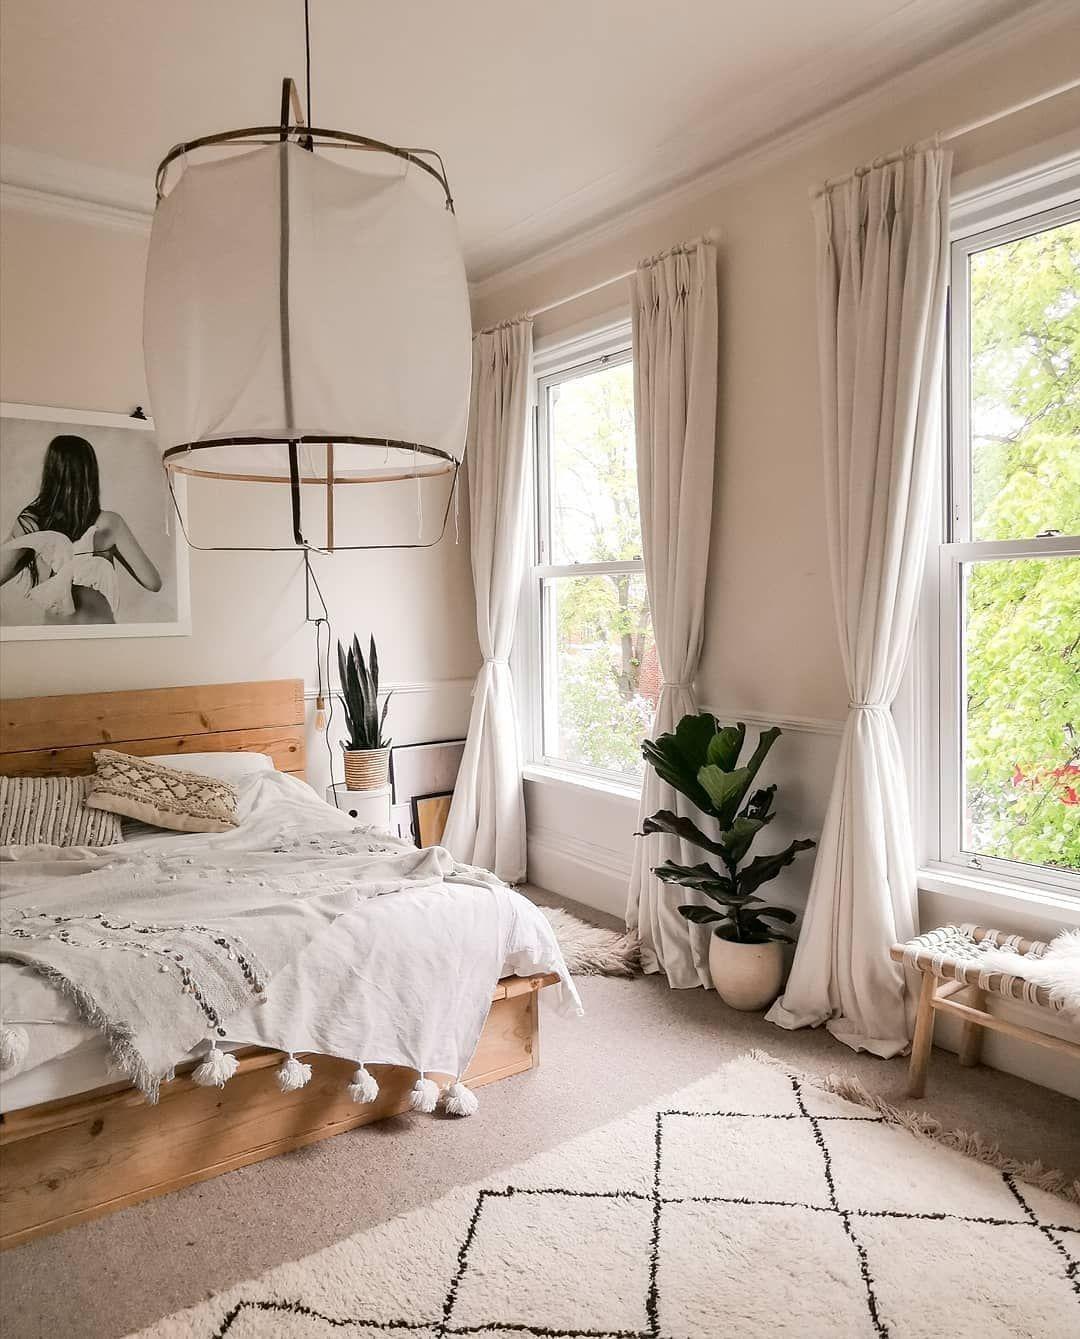 "HowWeLive on Instagram: ""Cozy bedroom with light colors in the beautiful home of @sallyfazelihome fromLancashire��#howwelive #repost #bedroom"""